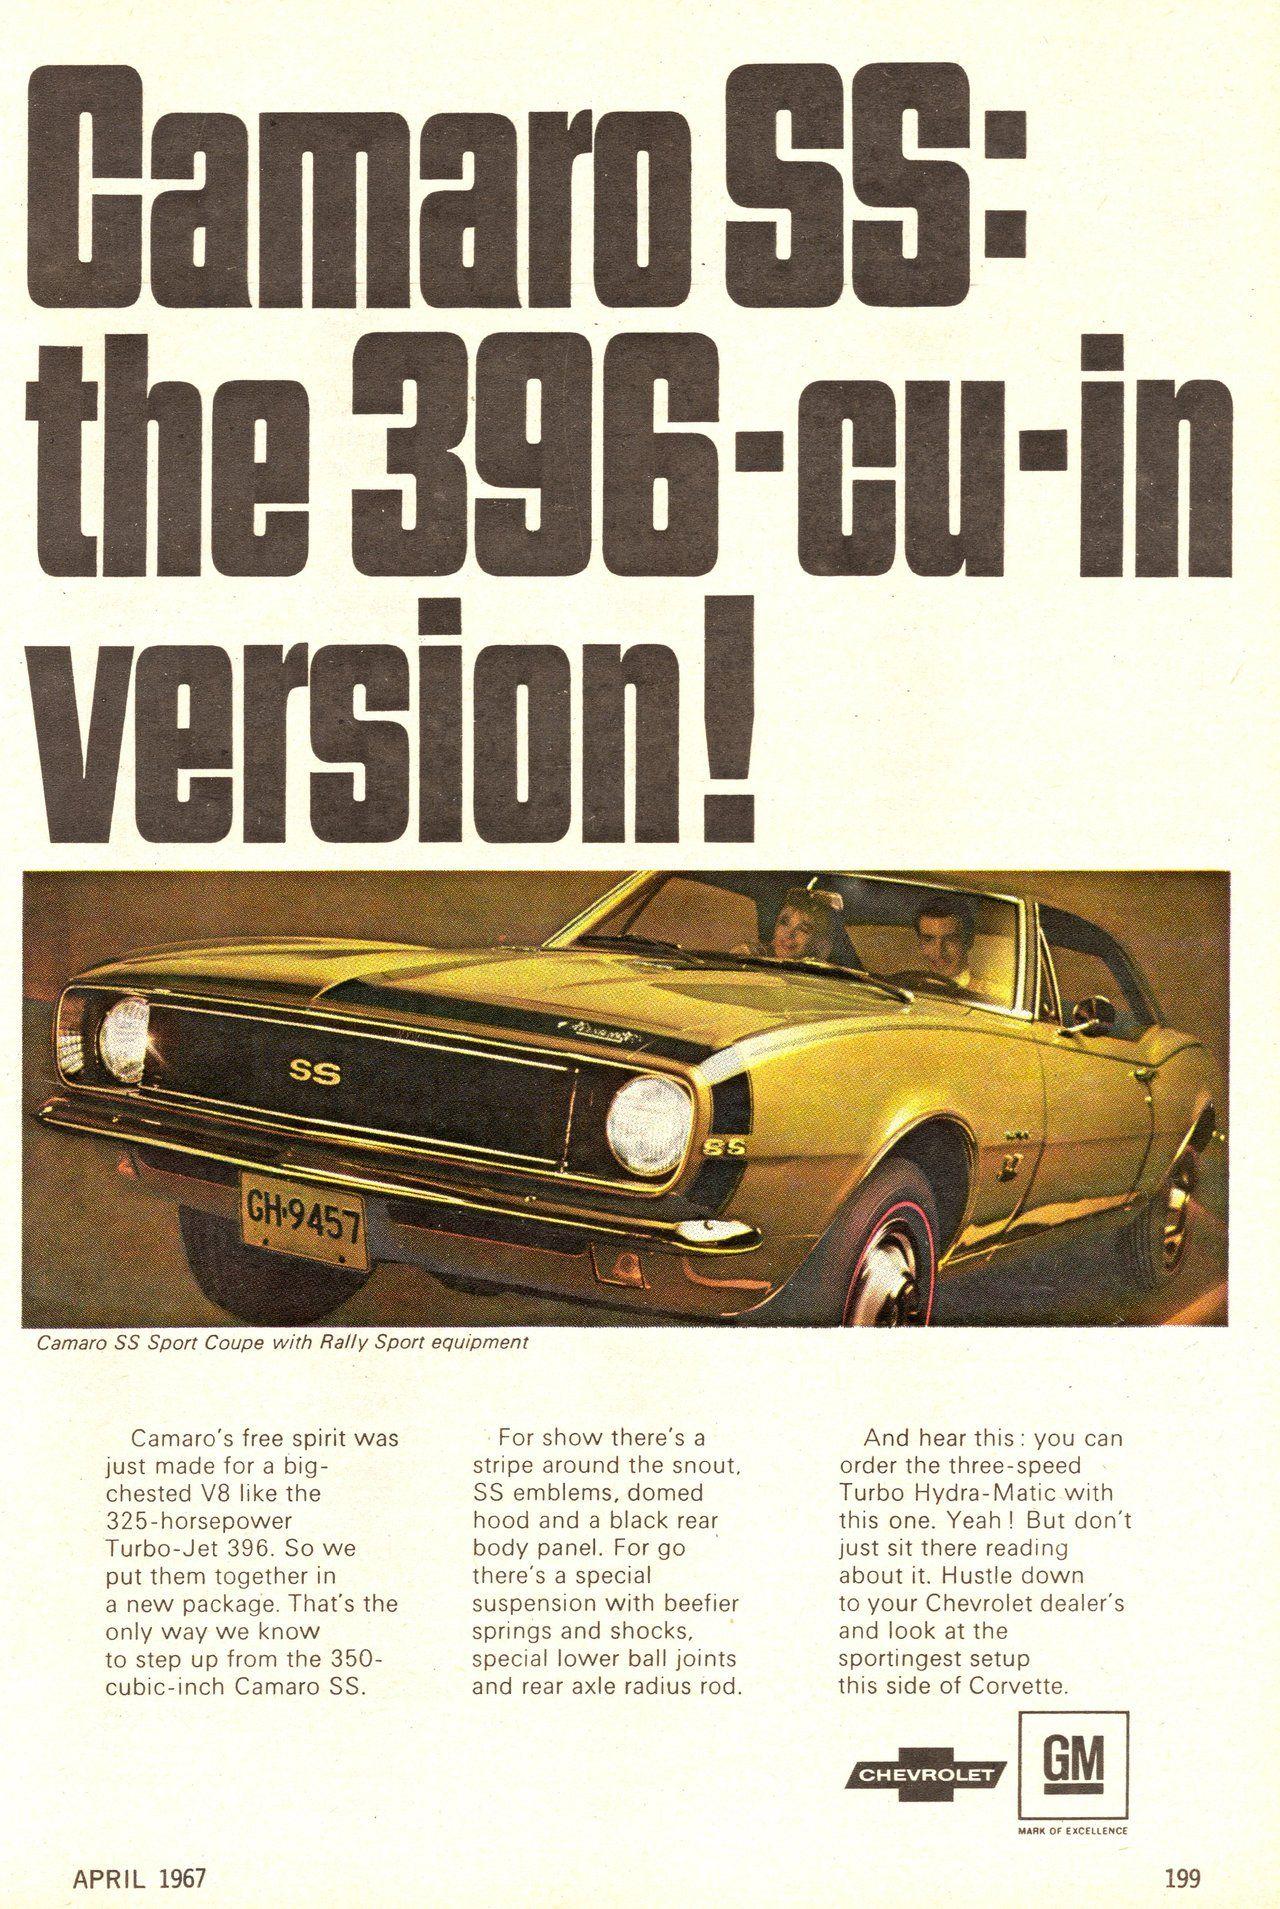 1967 Chevrolet Camaro SS Ad … camaro ss